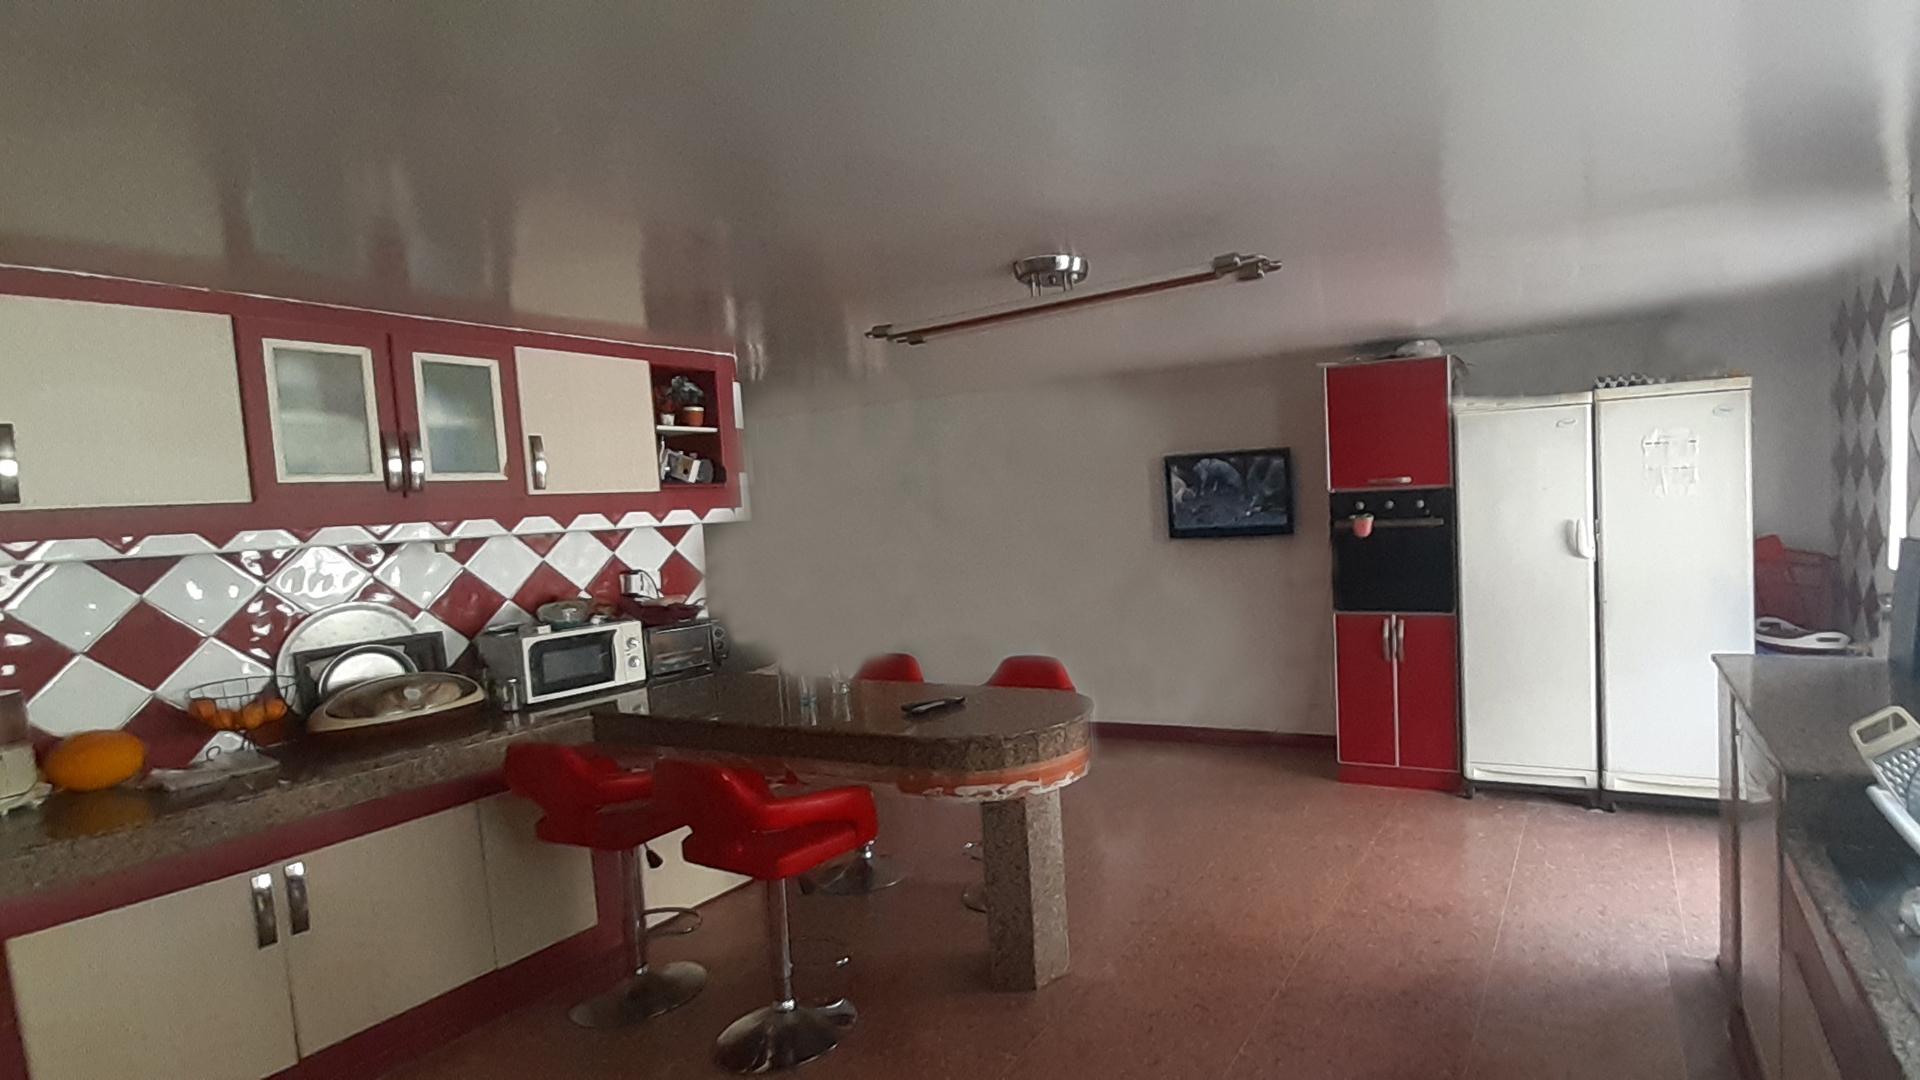 Villa 202 m meublée à vendre sur Avenue Annakhil Hay Riad